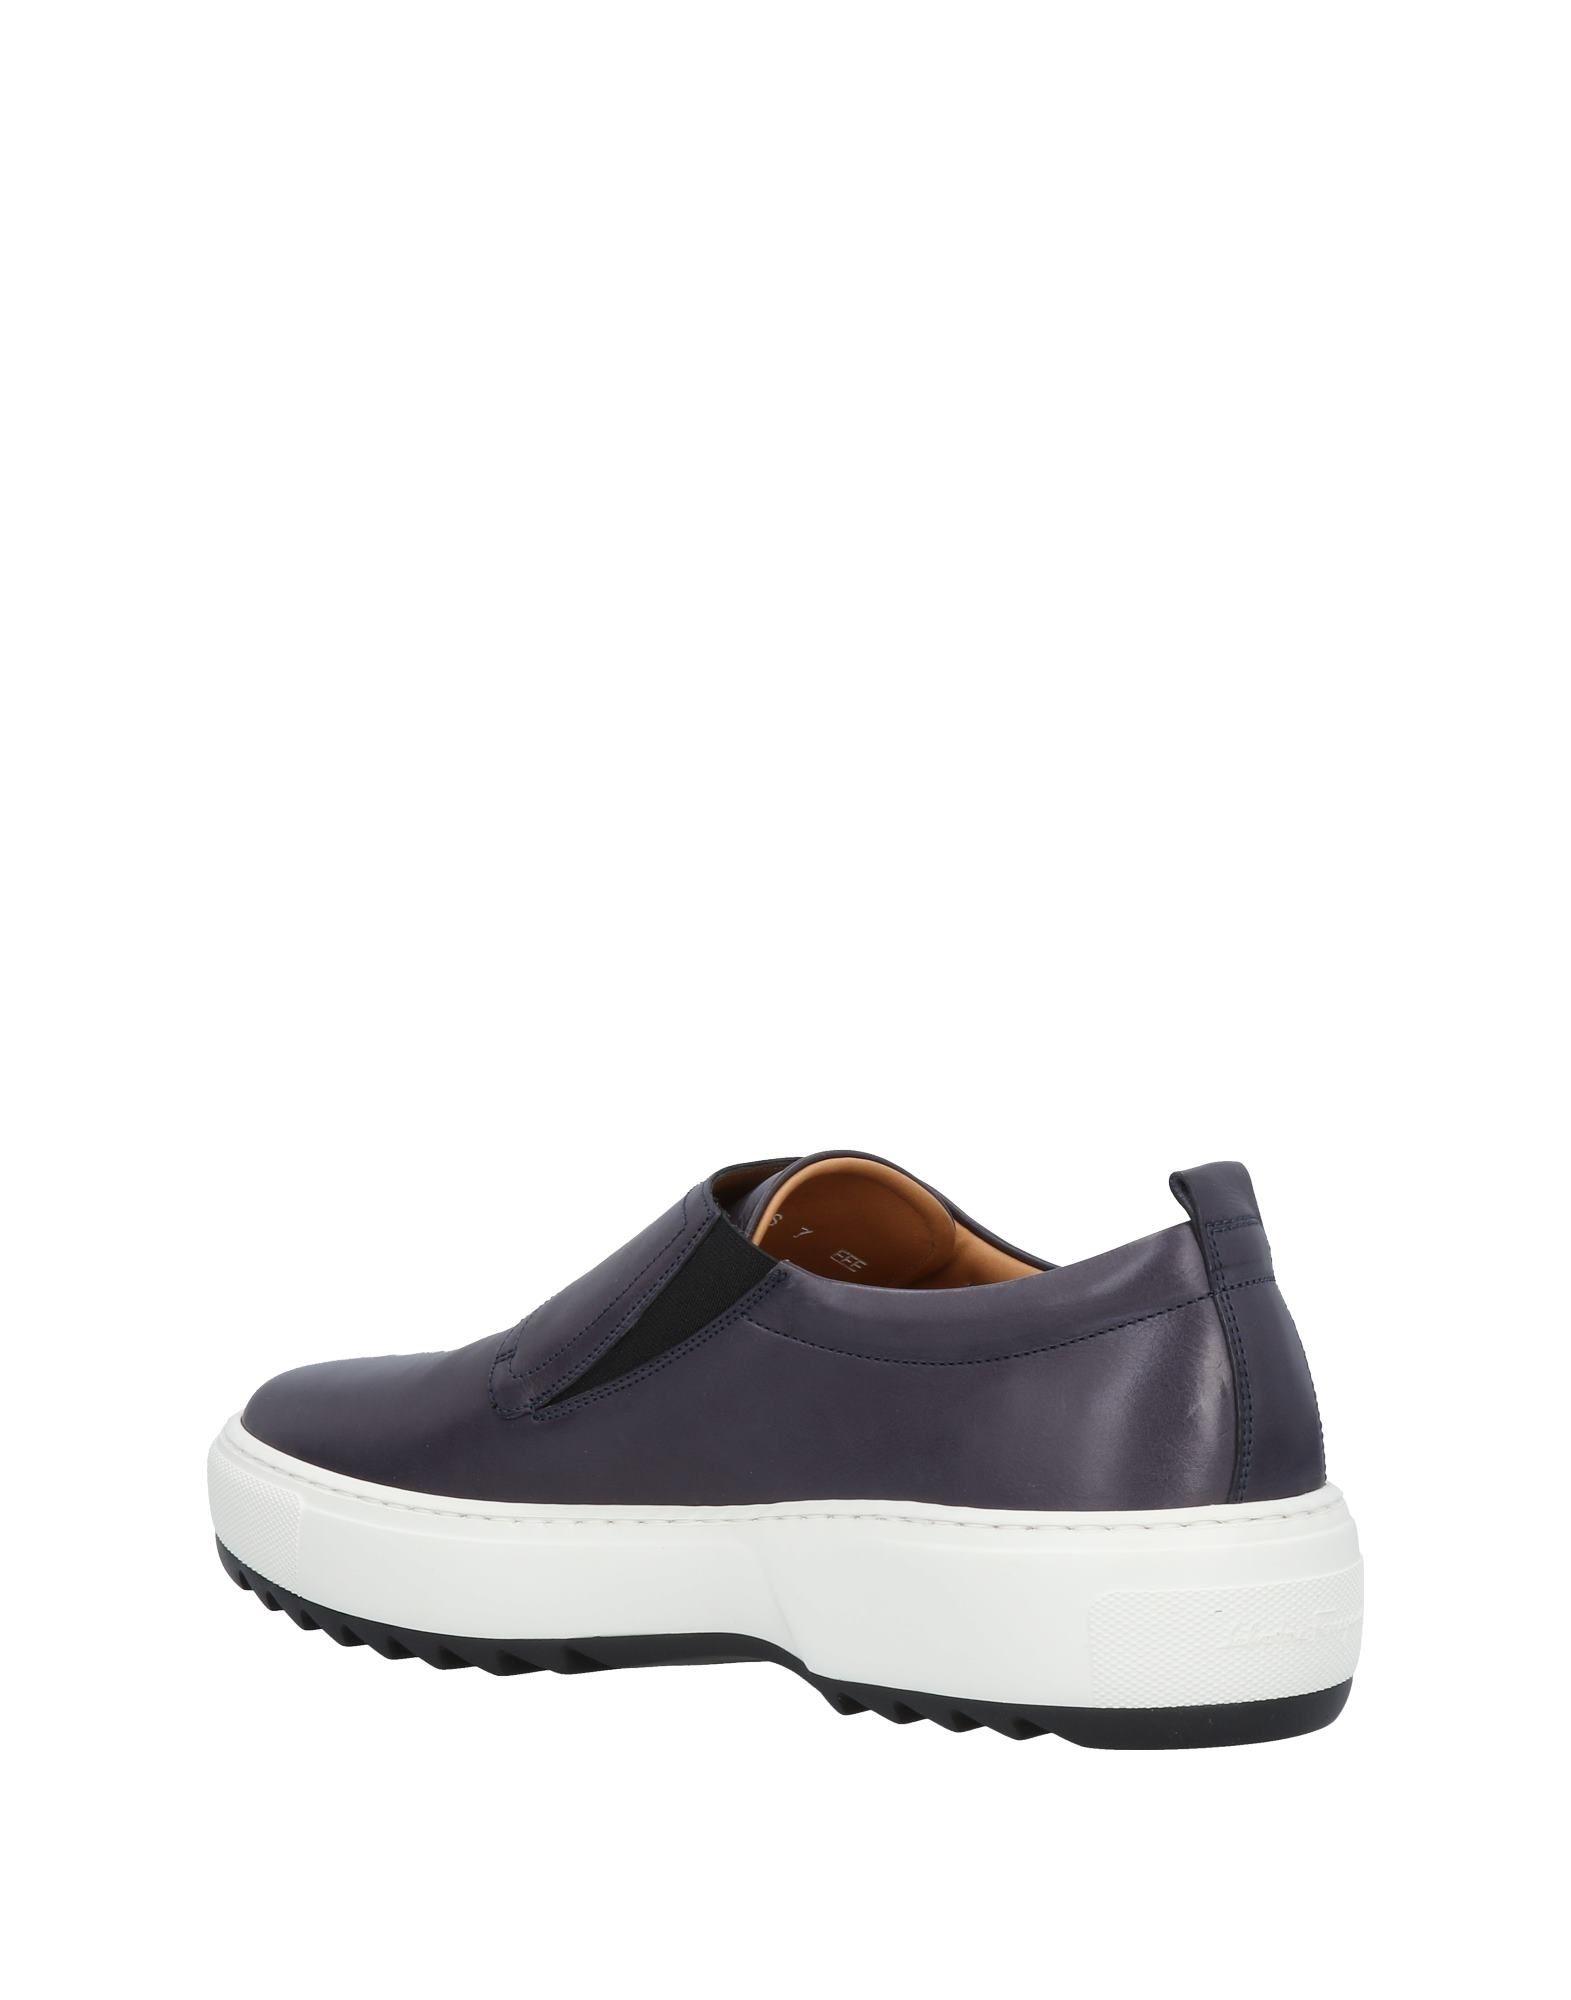 Salvatore 11488907XP Ferragamo Sneakers Herren  11488907XP Salvatore Gute Qualität beliebte Schuhe 611ab1